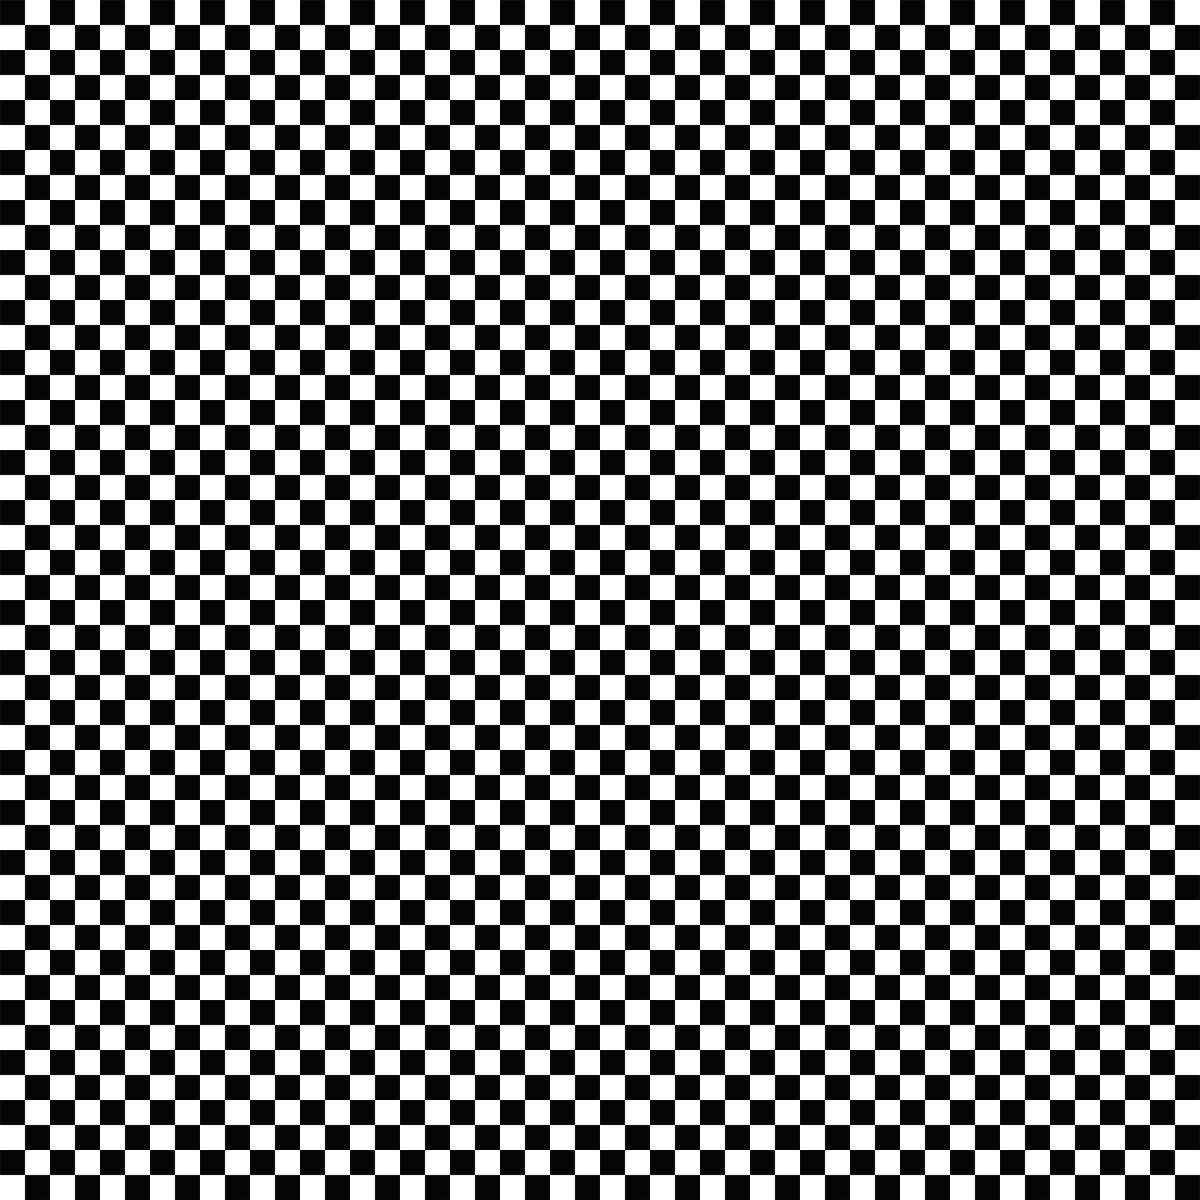 30 Black And White Check Wallpaper On Wallpapersafari